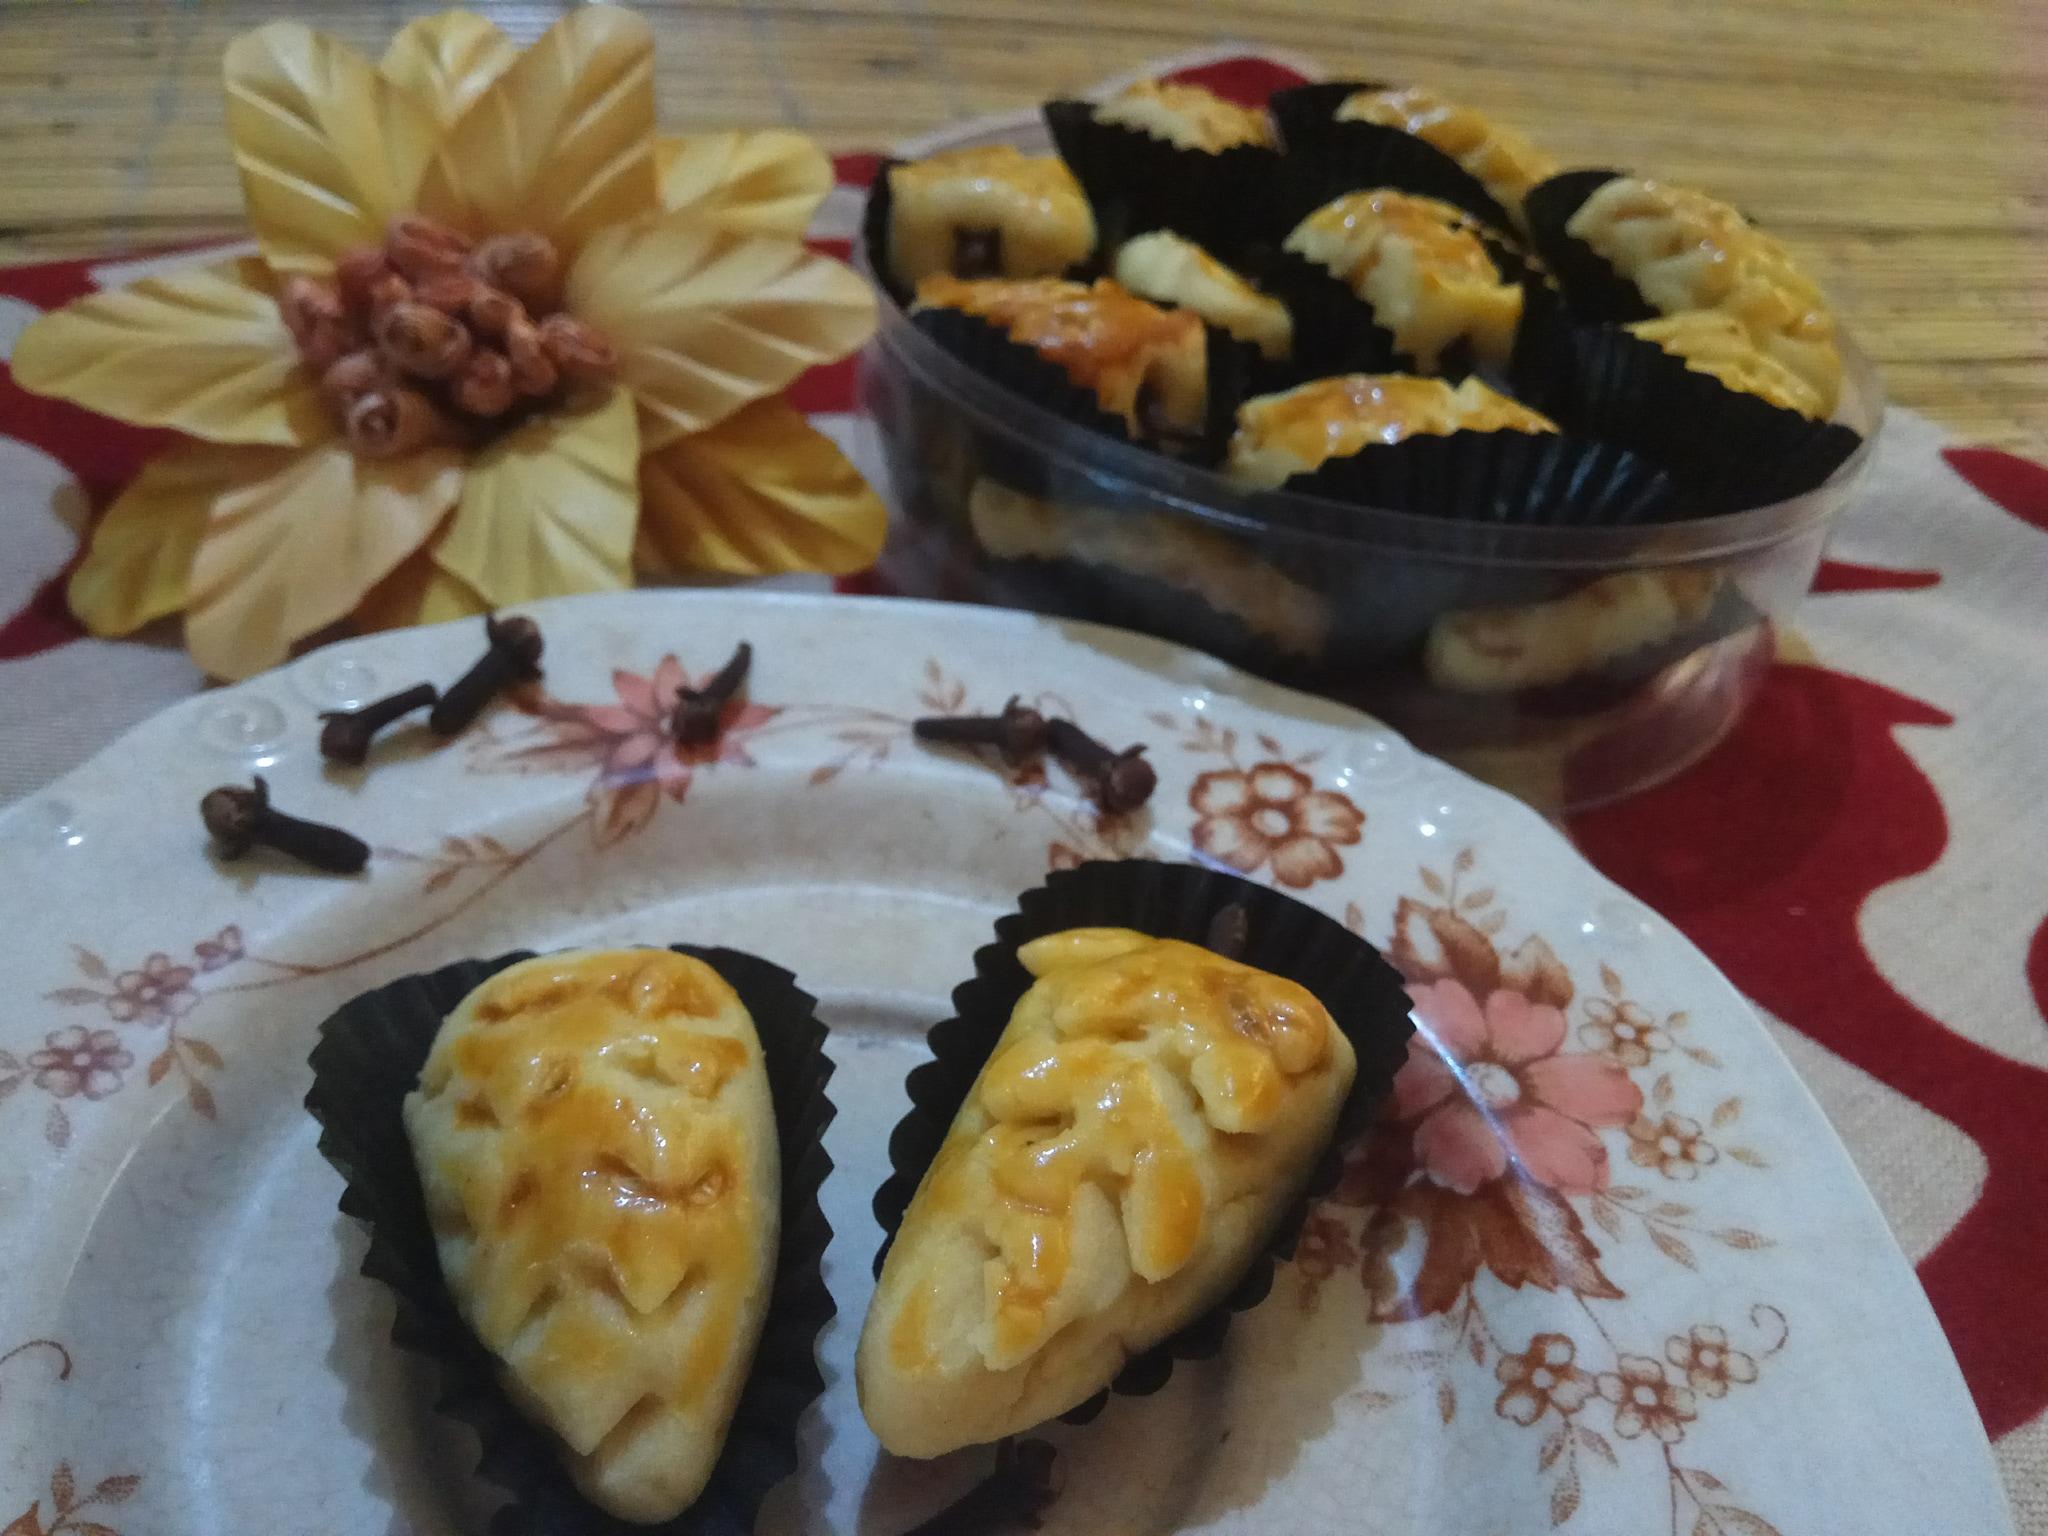 Jual Kue Nastar Keju Wisman Special Pineapple Cookie Premium 250gr Edam Ascashop Tokopedia